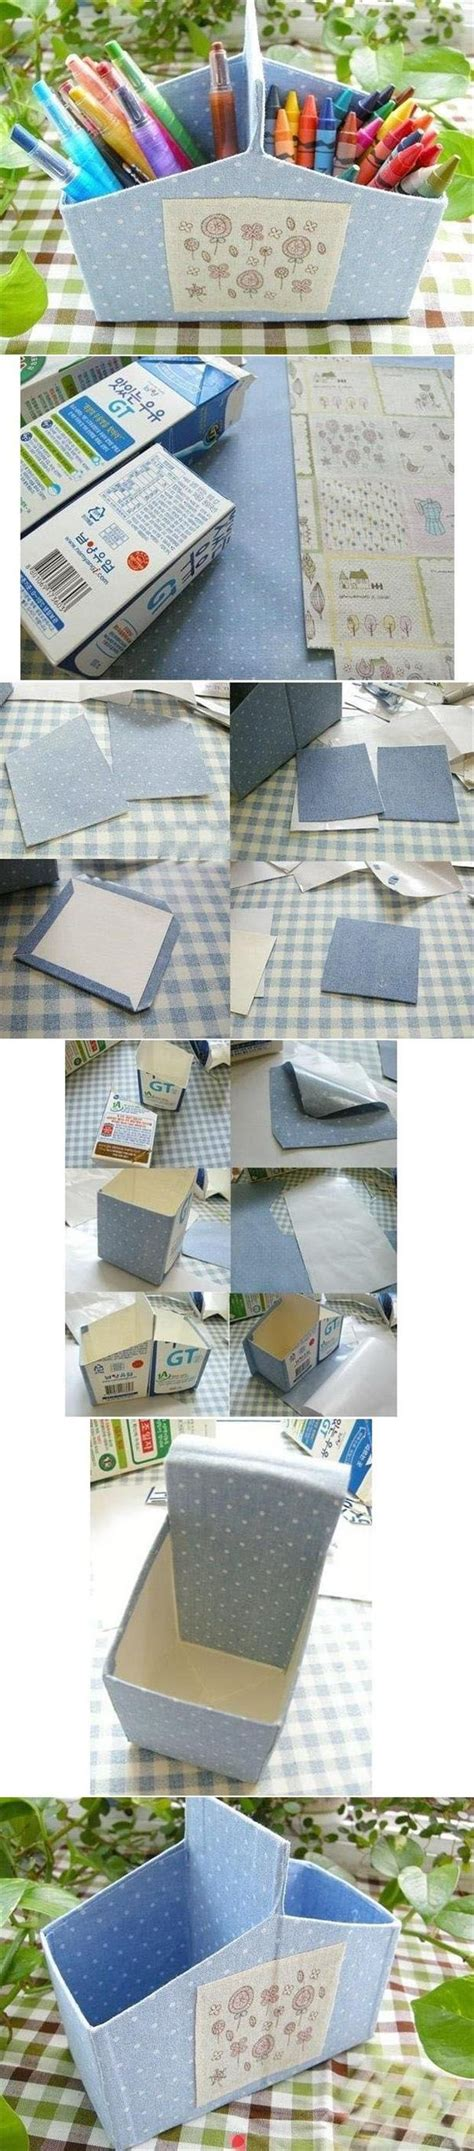 fun do it yourself craft ideas 30 pics milk carton crafts dump a day